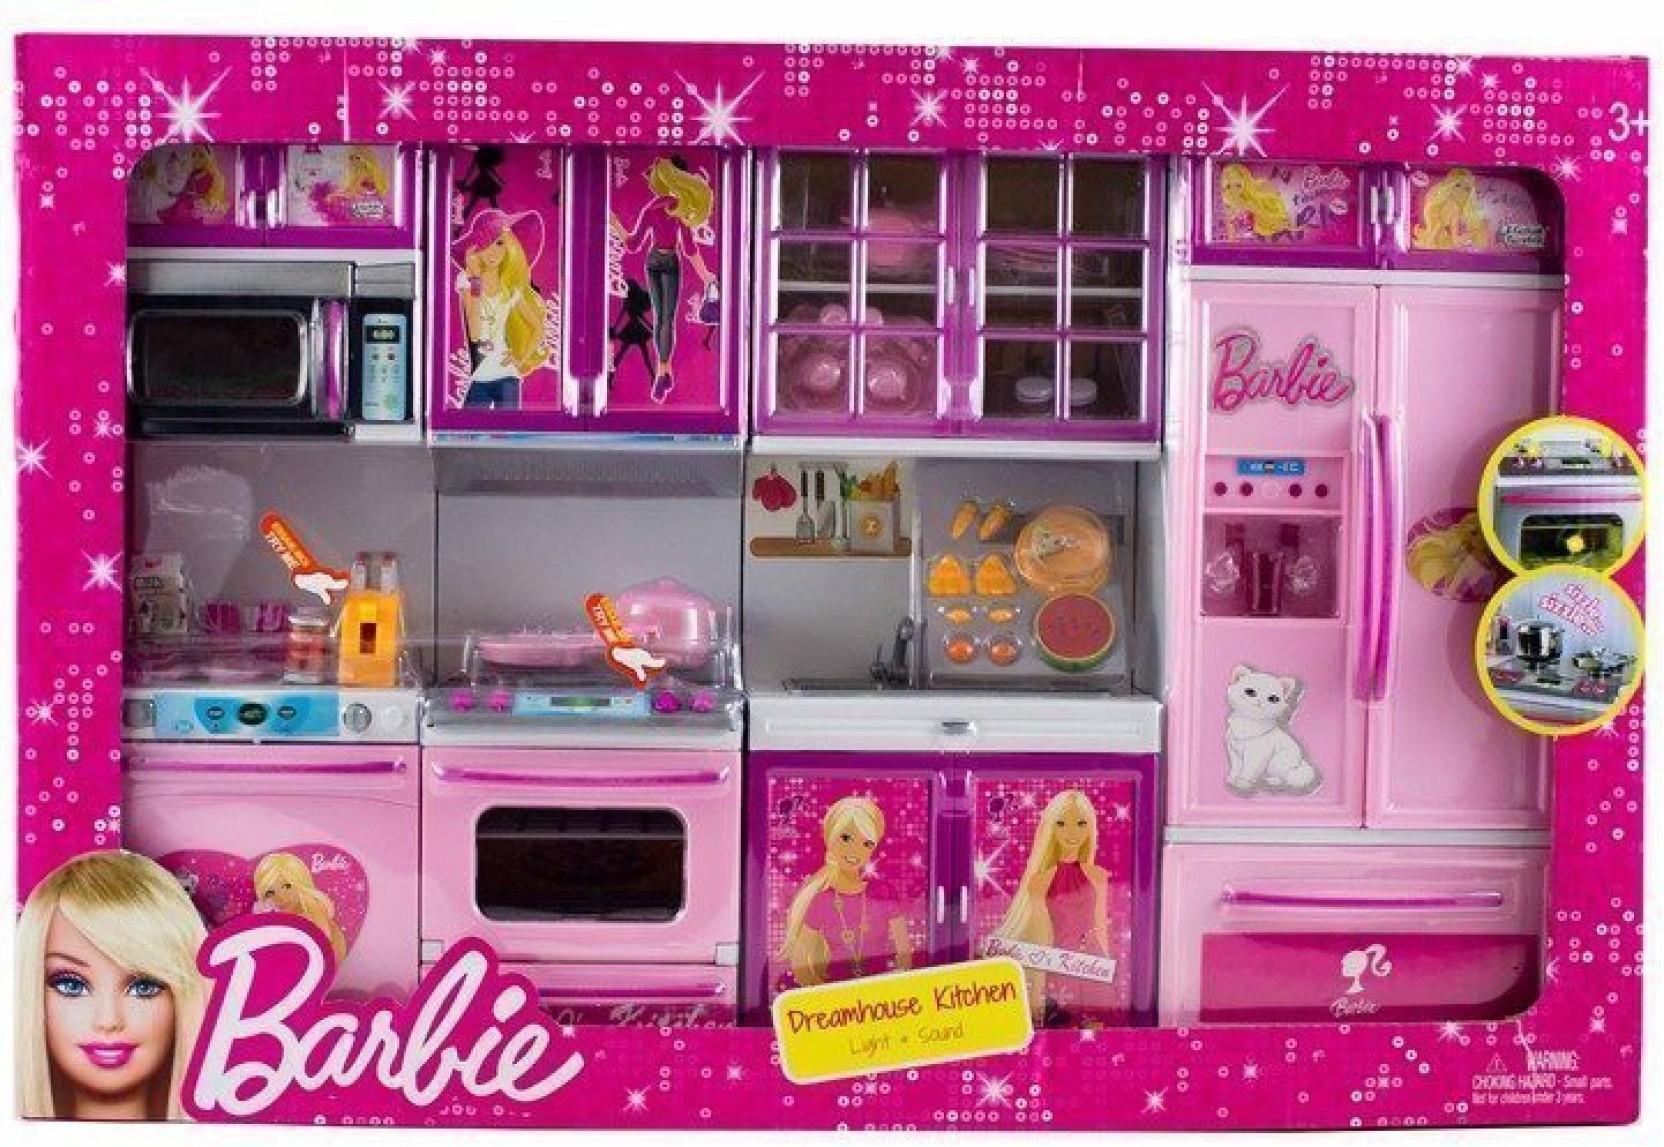 WE BLINK Barbie Kitchen Set ADD TO CART